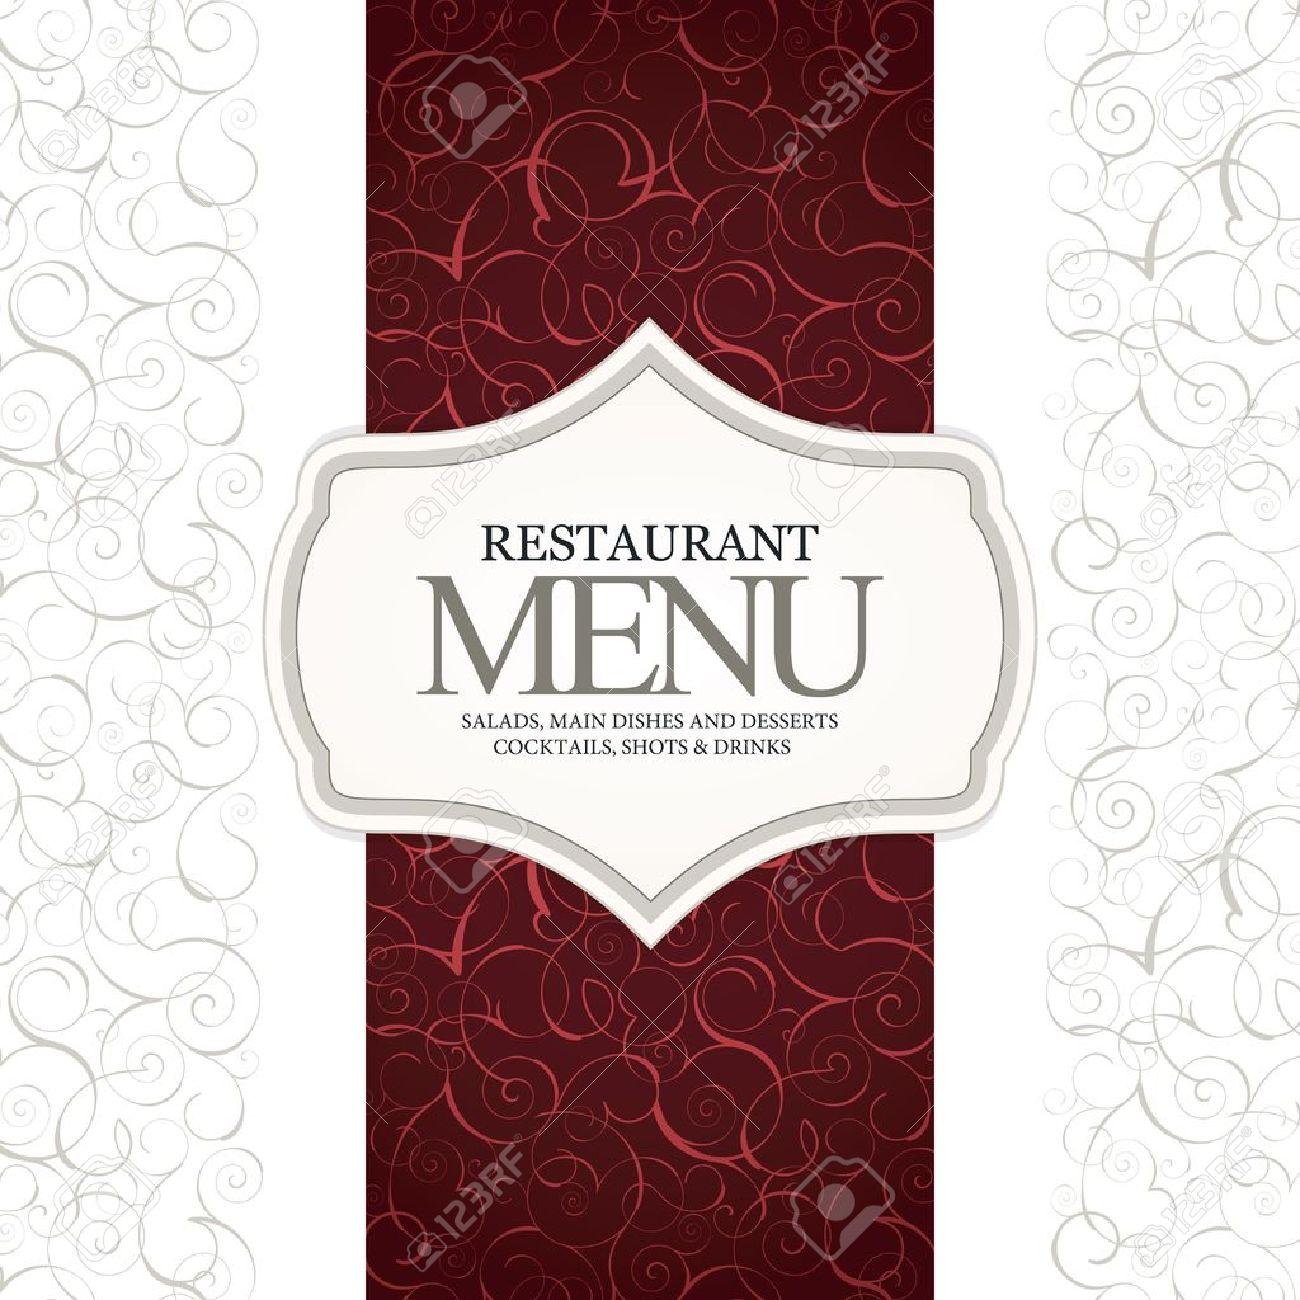 restaurant menu design royalty free cliparts, vectors, and stock